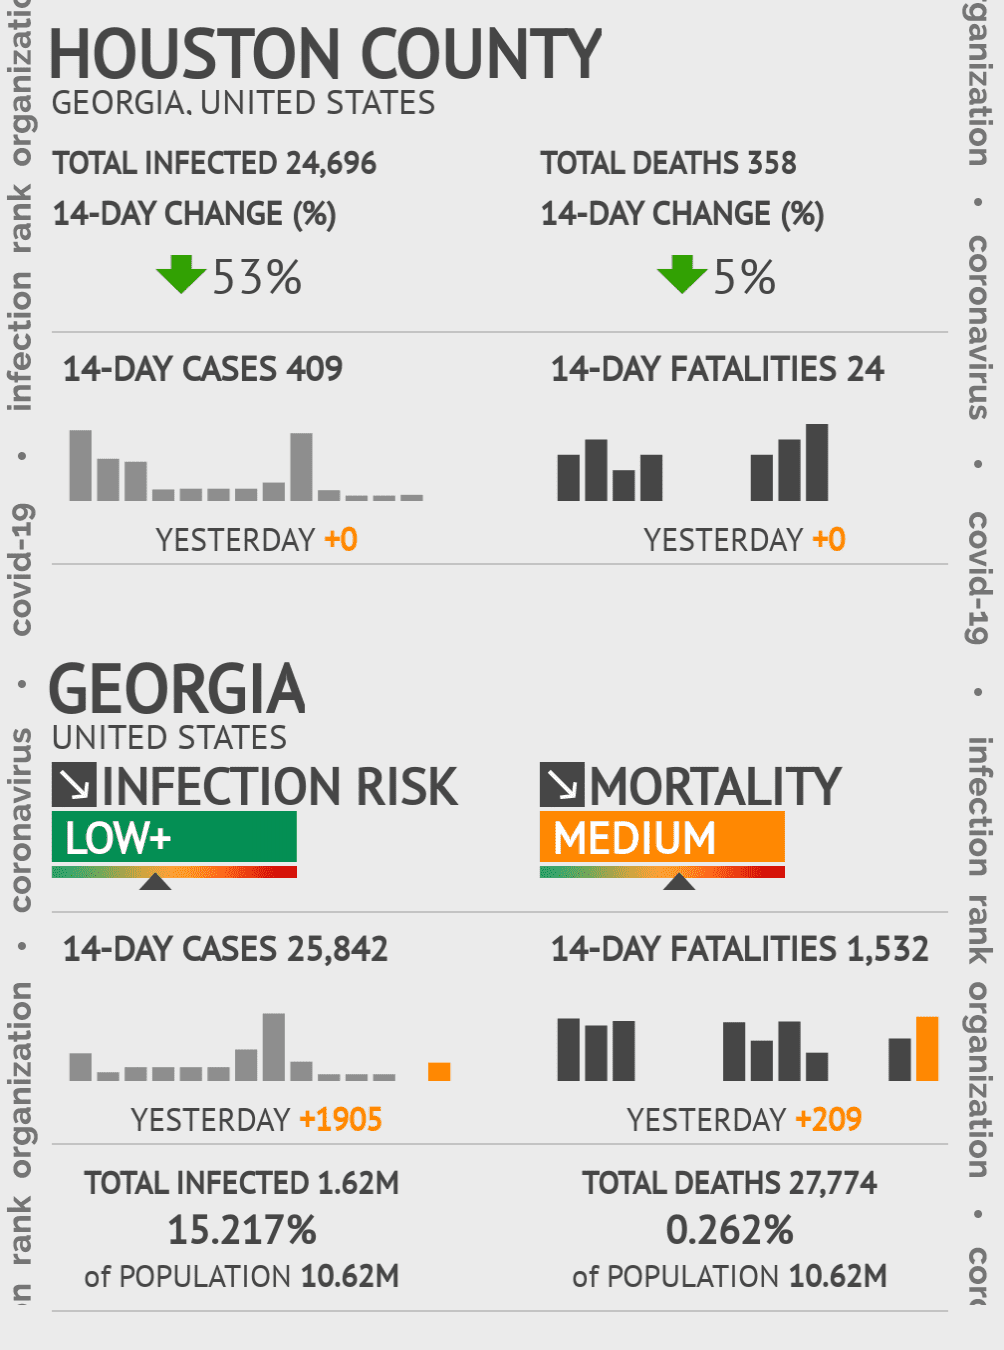 Houston County Coronavirus Covid-19 Risk of Infection on July 24, 2021